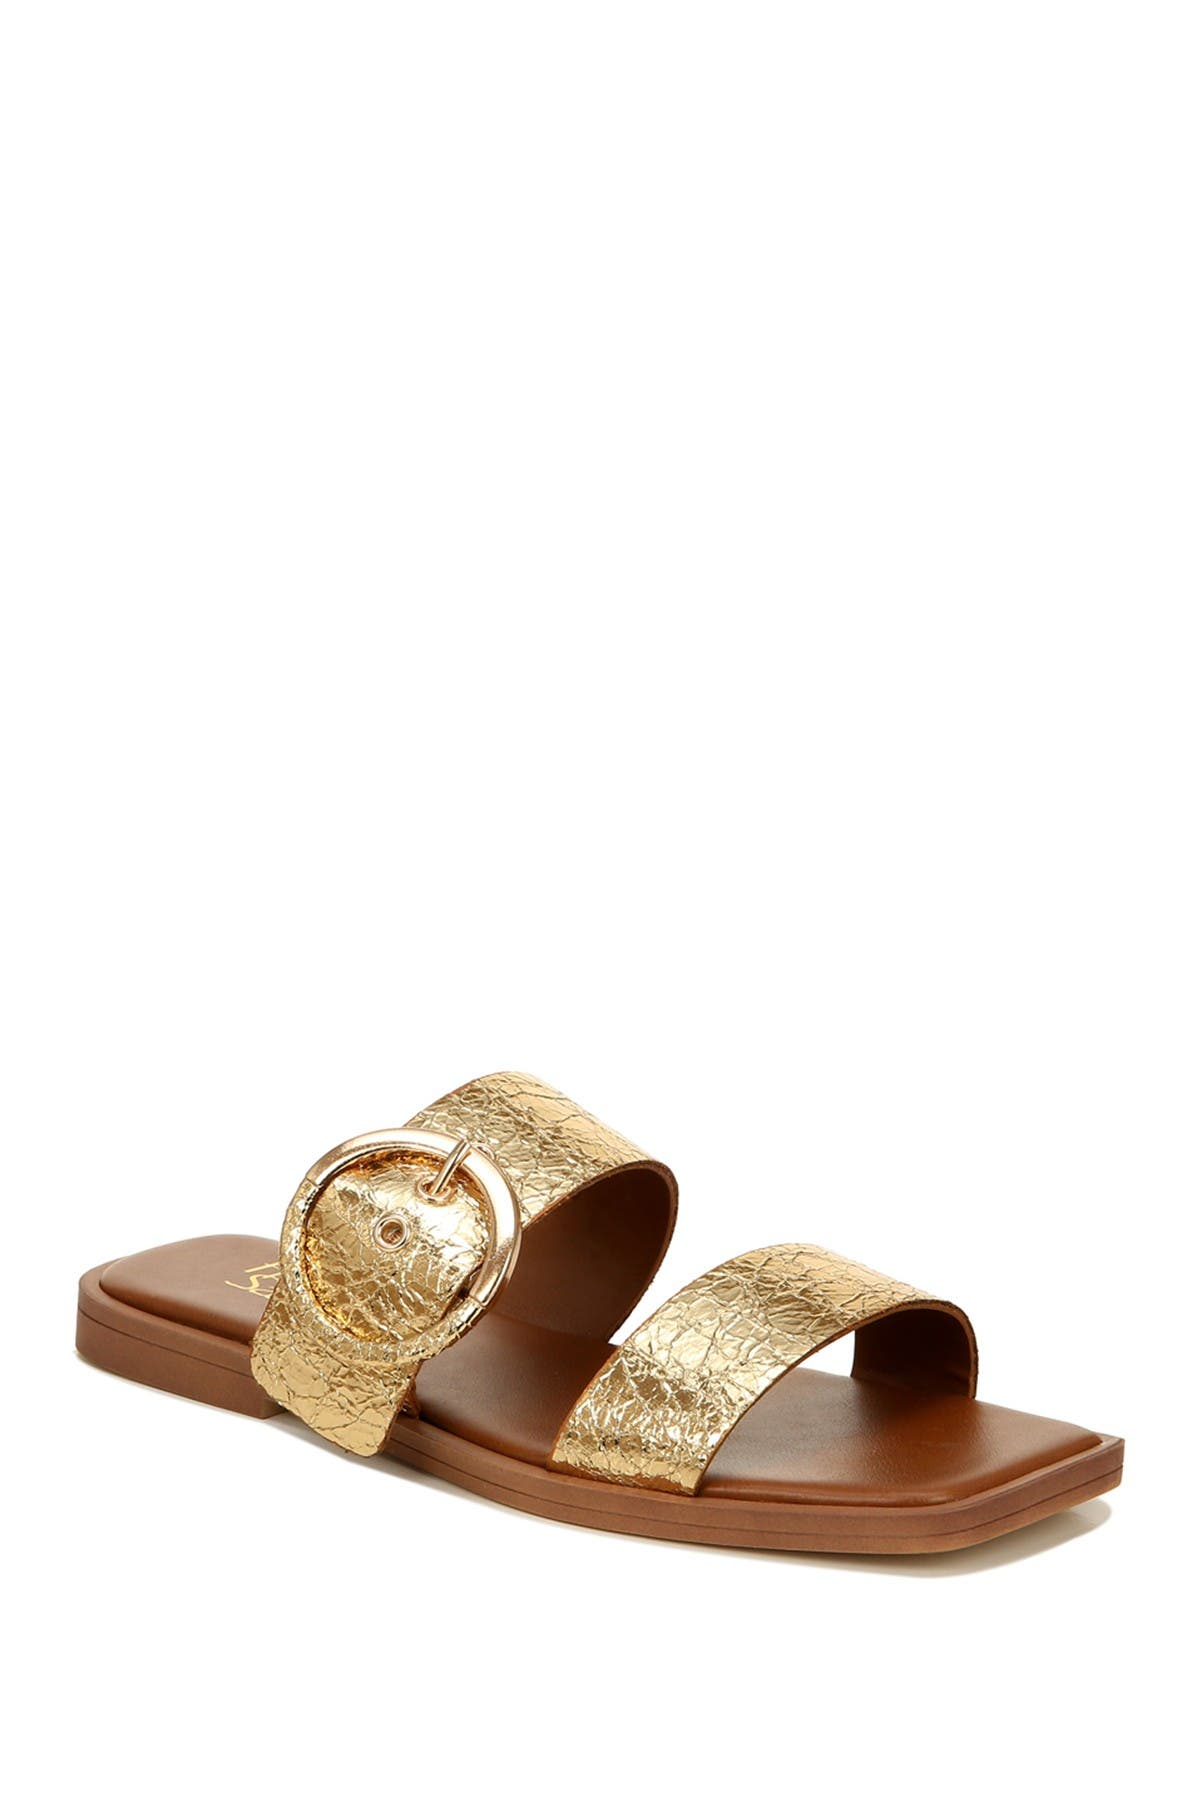 Image of Franco Sarto Merris Croc Embossed Sandal